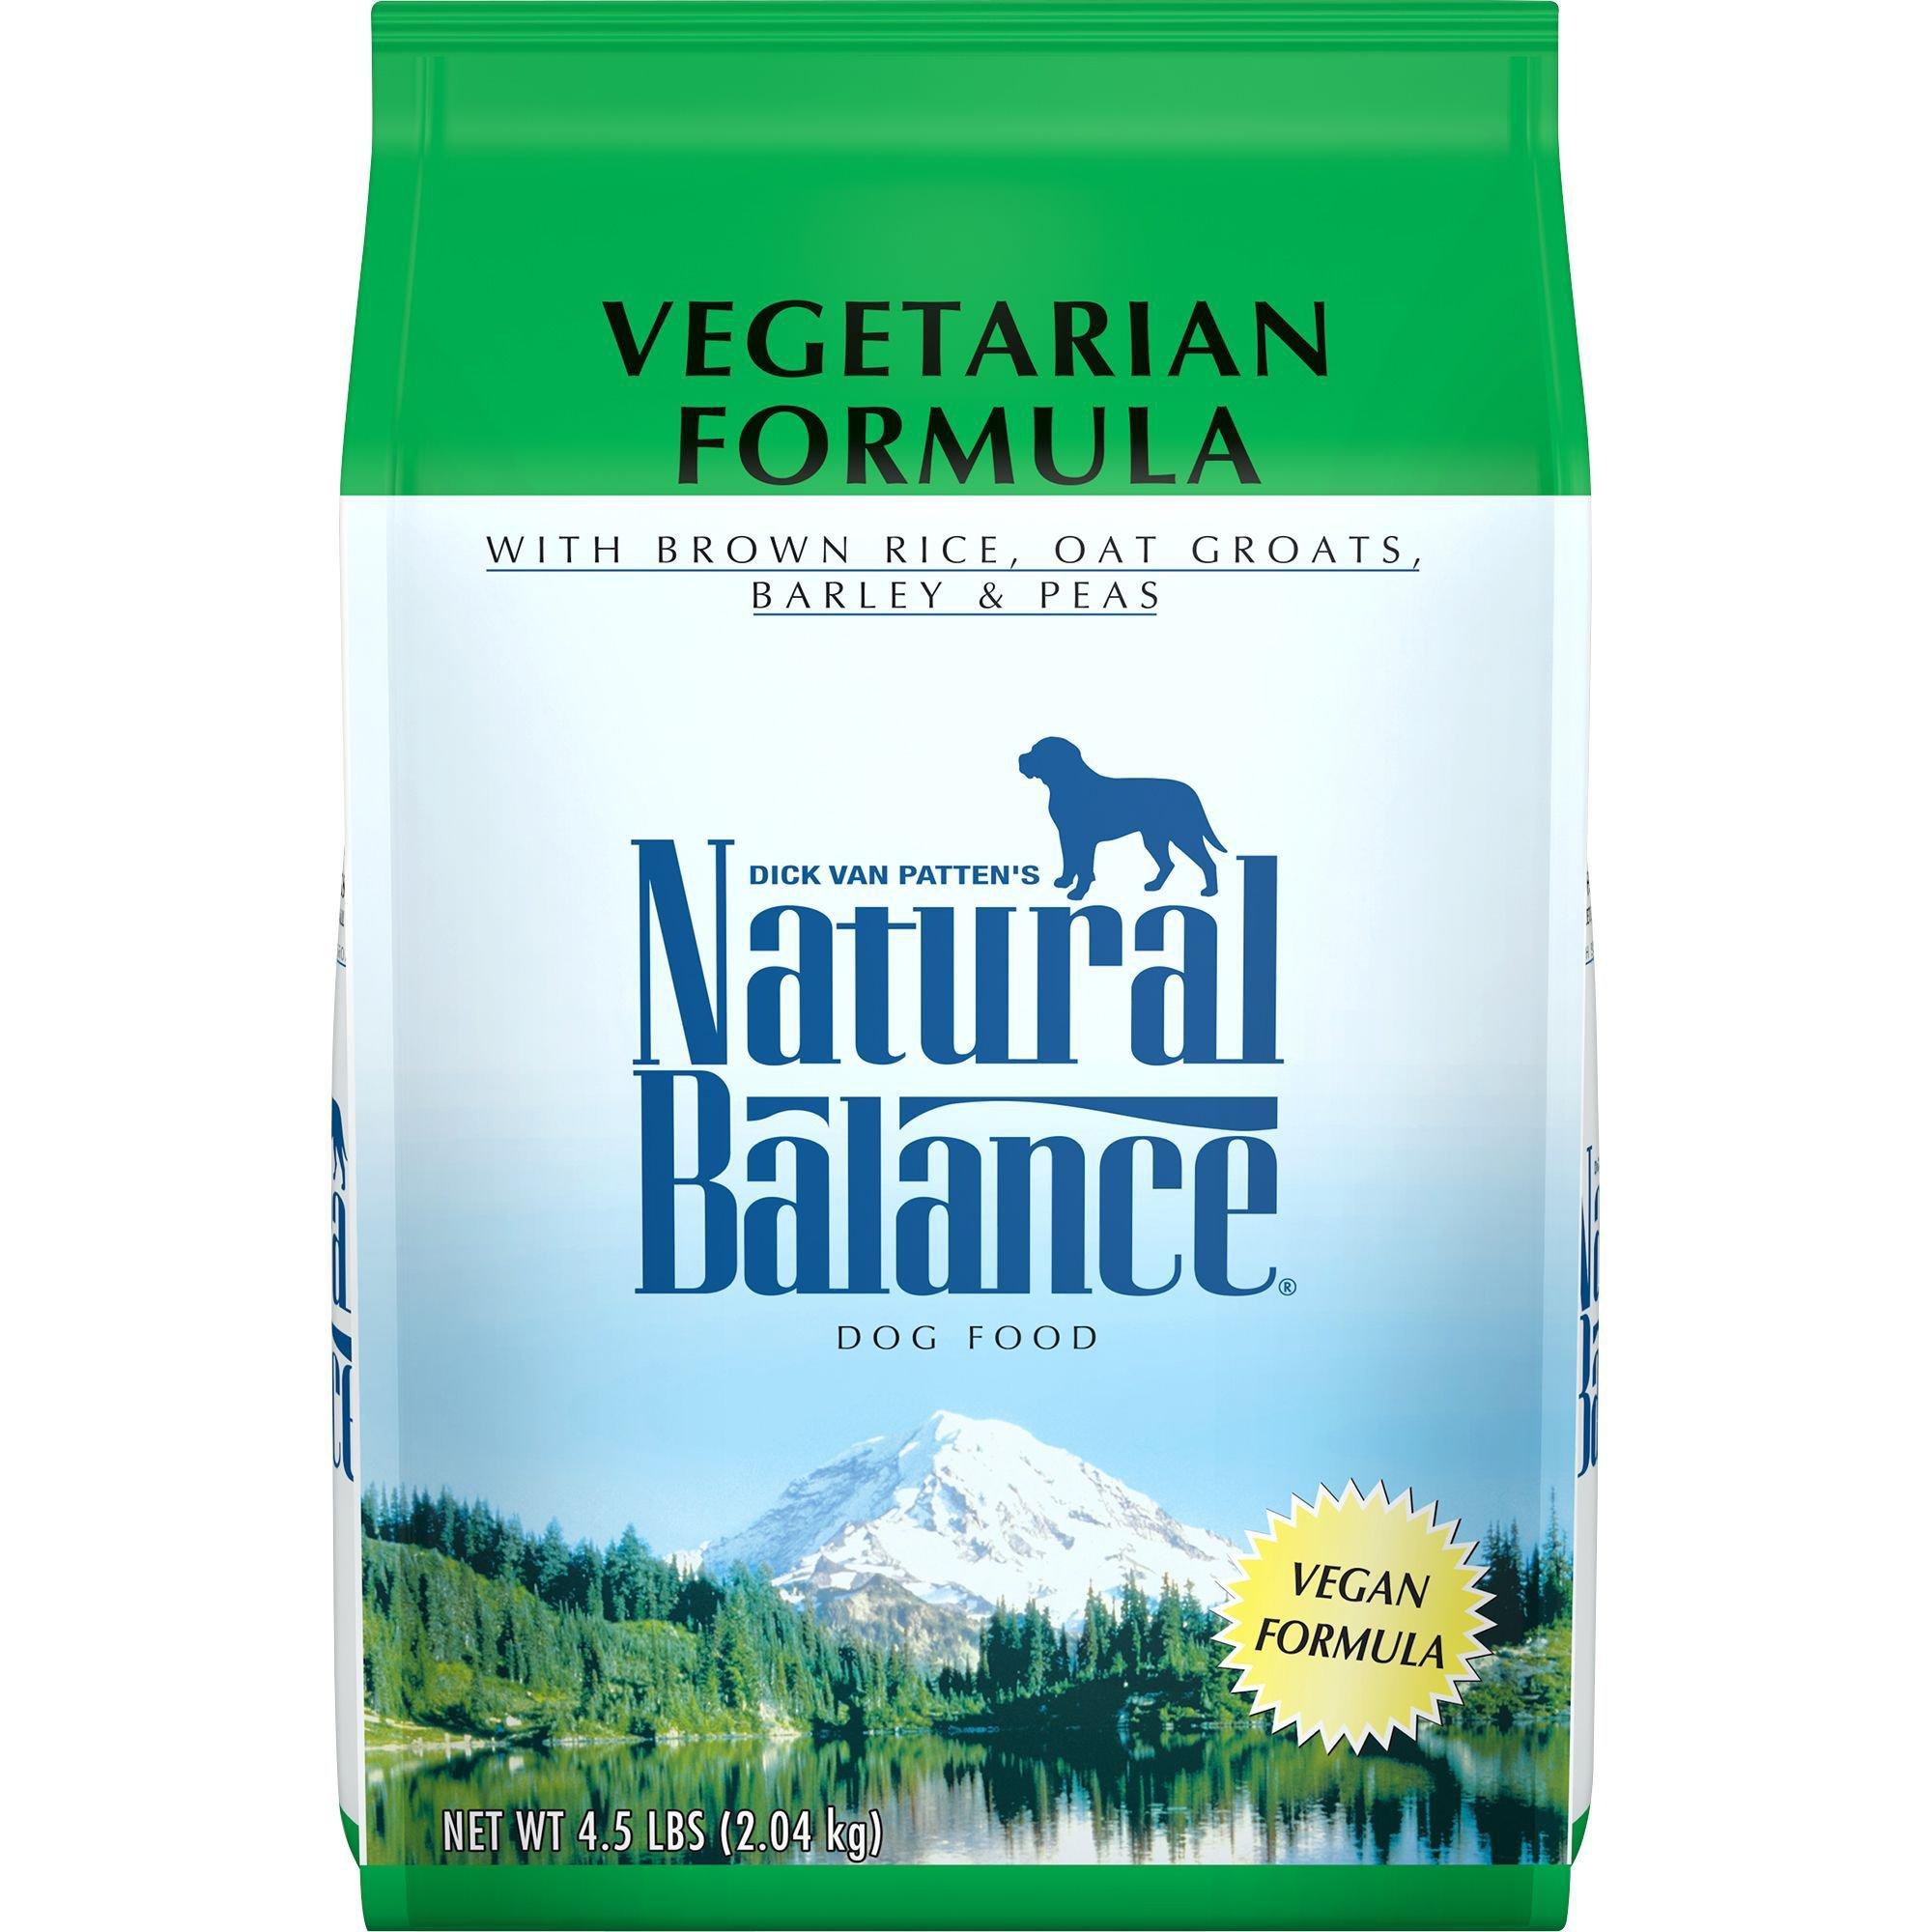 natural balance vegetarian formula dog food 14 lbs